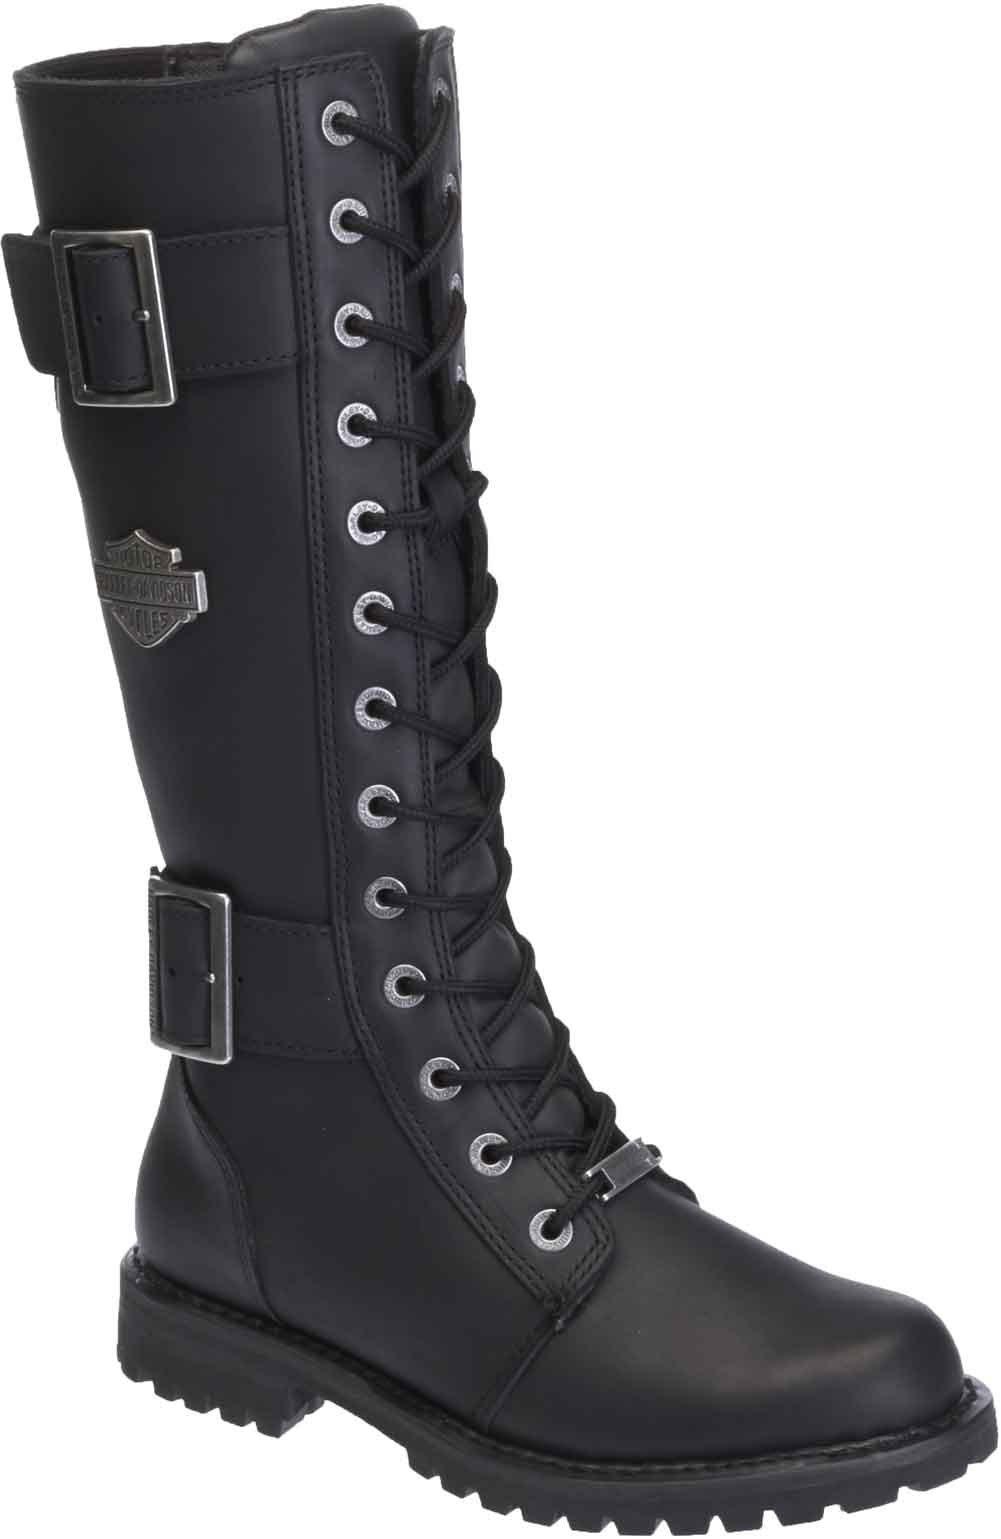 Harley-Davidson Women's Belhaven Knee-High Motorcycle Boots. D87082 (Black 11)